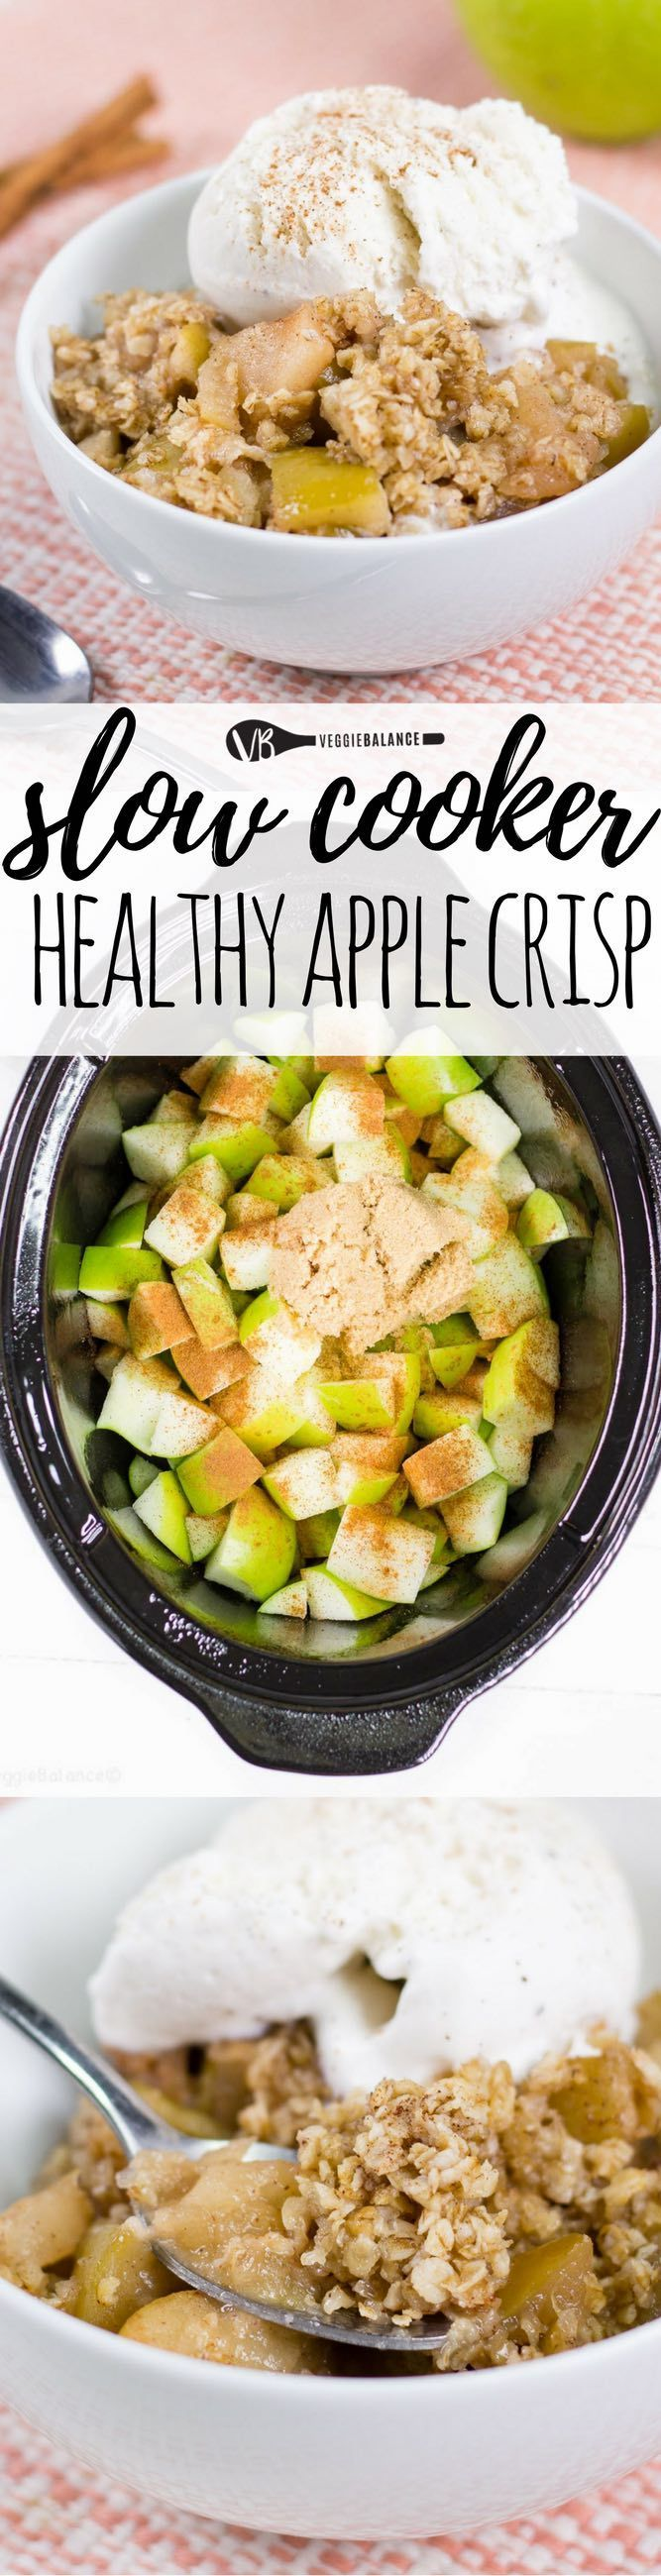 Healthy Apple Crisp in Slow Cooker (gluten-free) - Veggie Balance